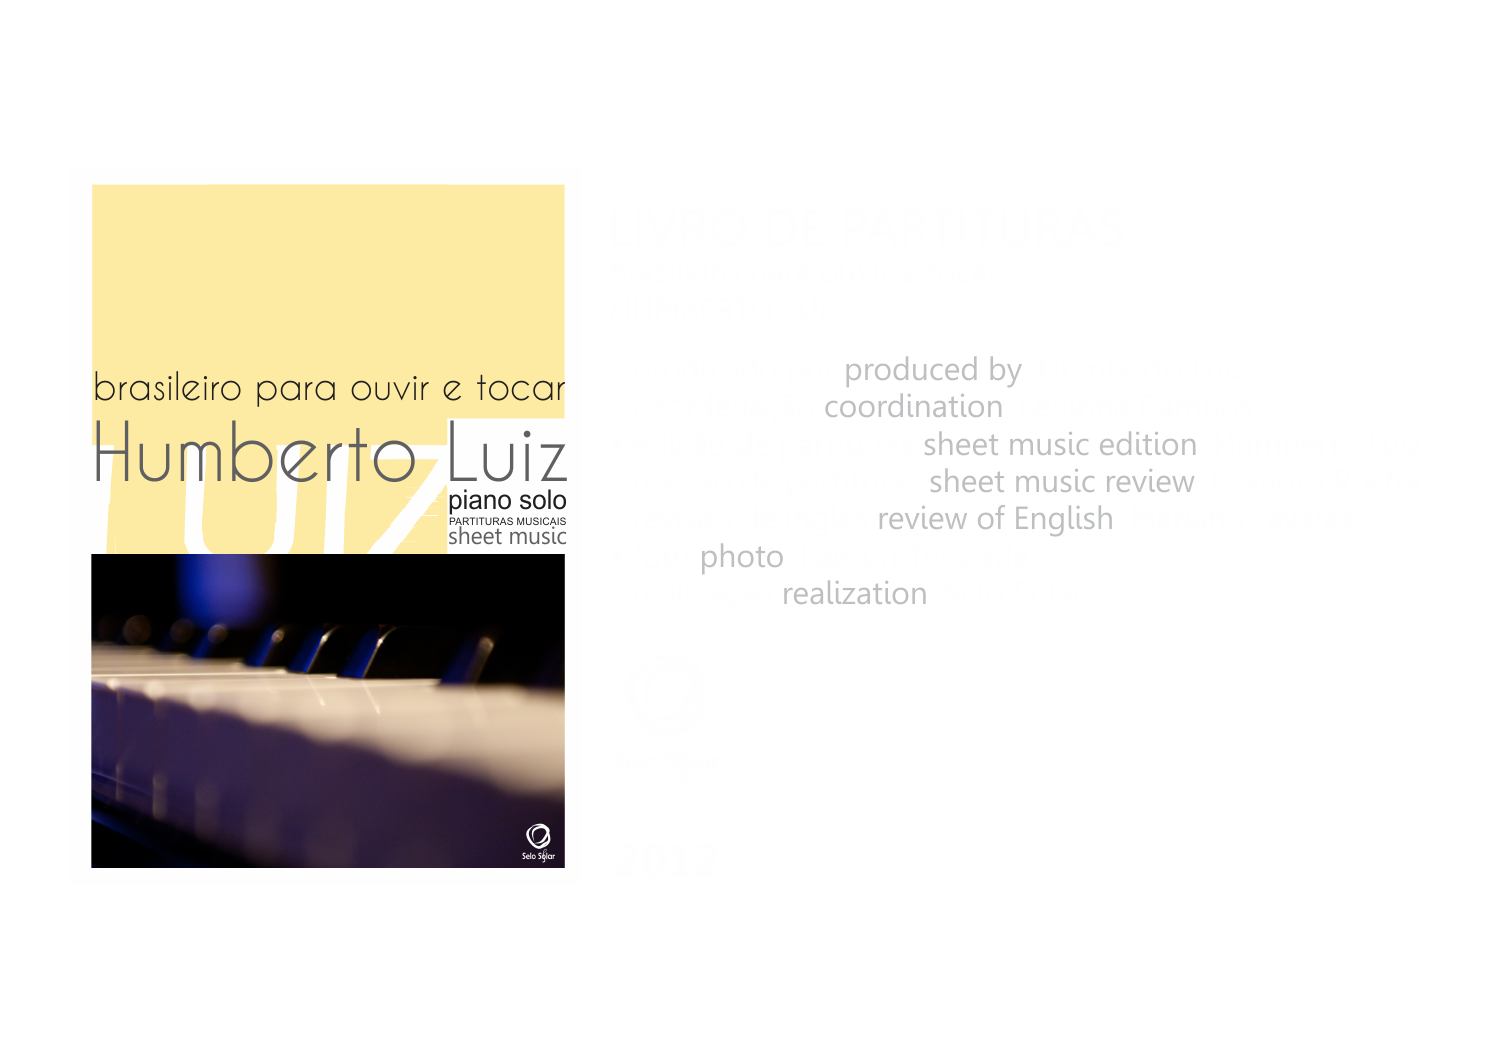 Livro -brasileiro para ouvir e tocar